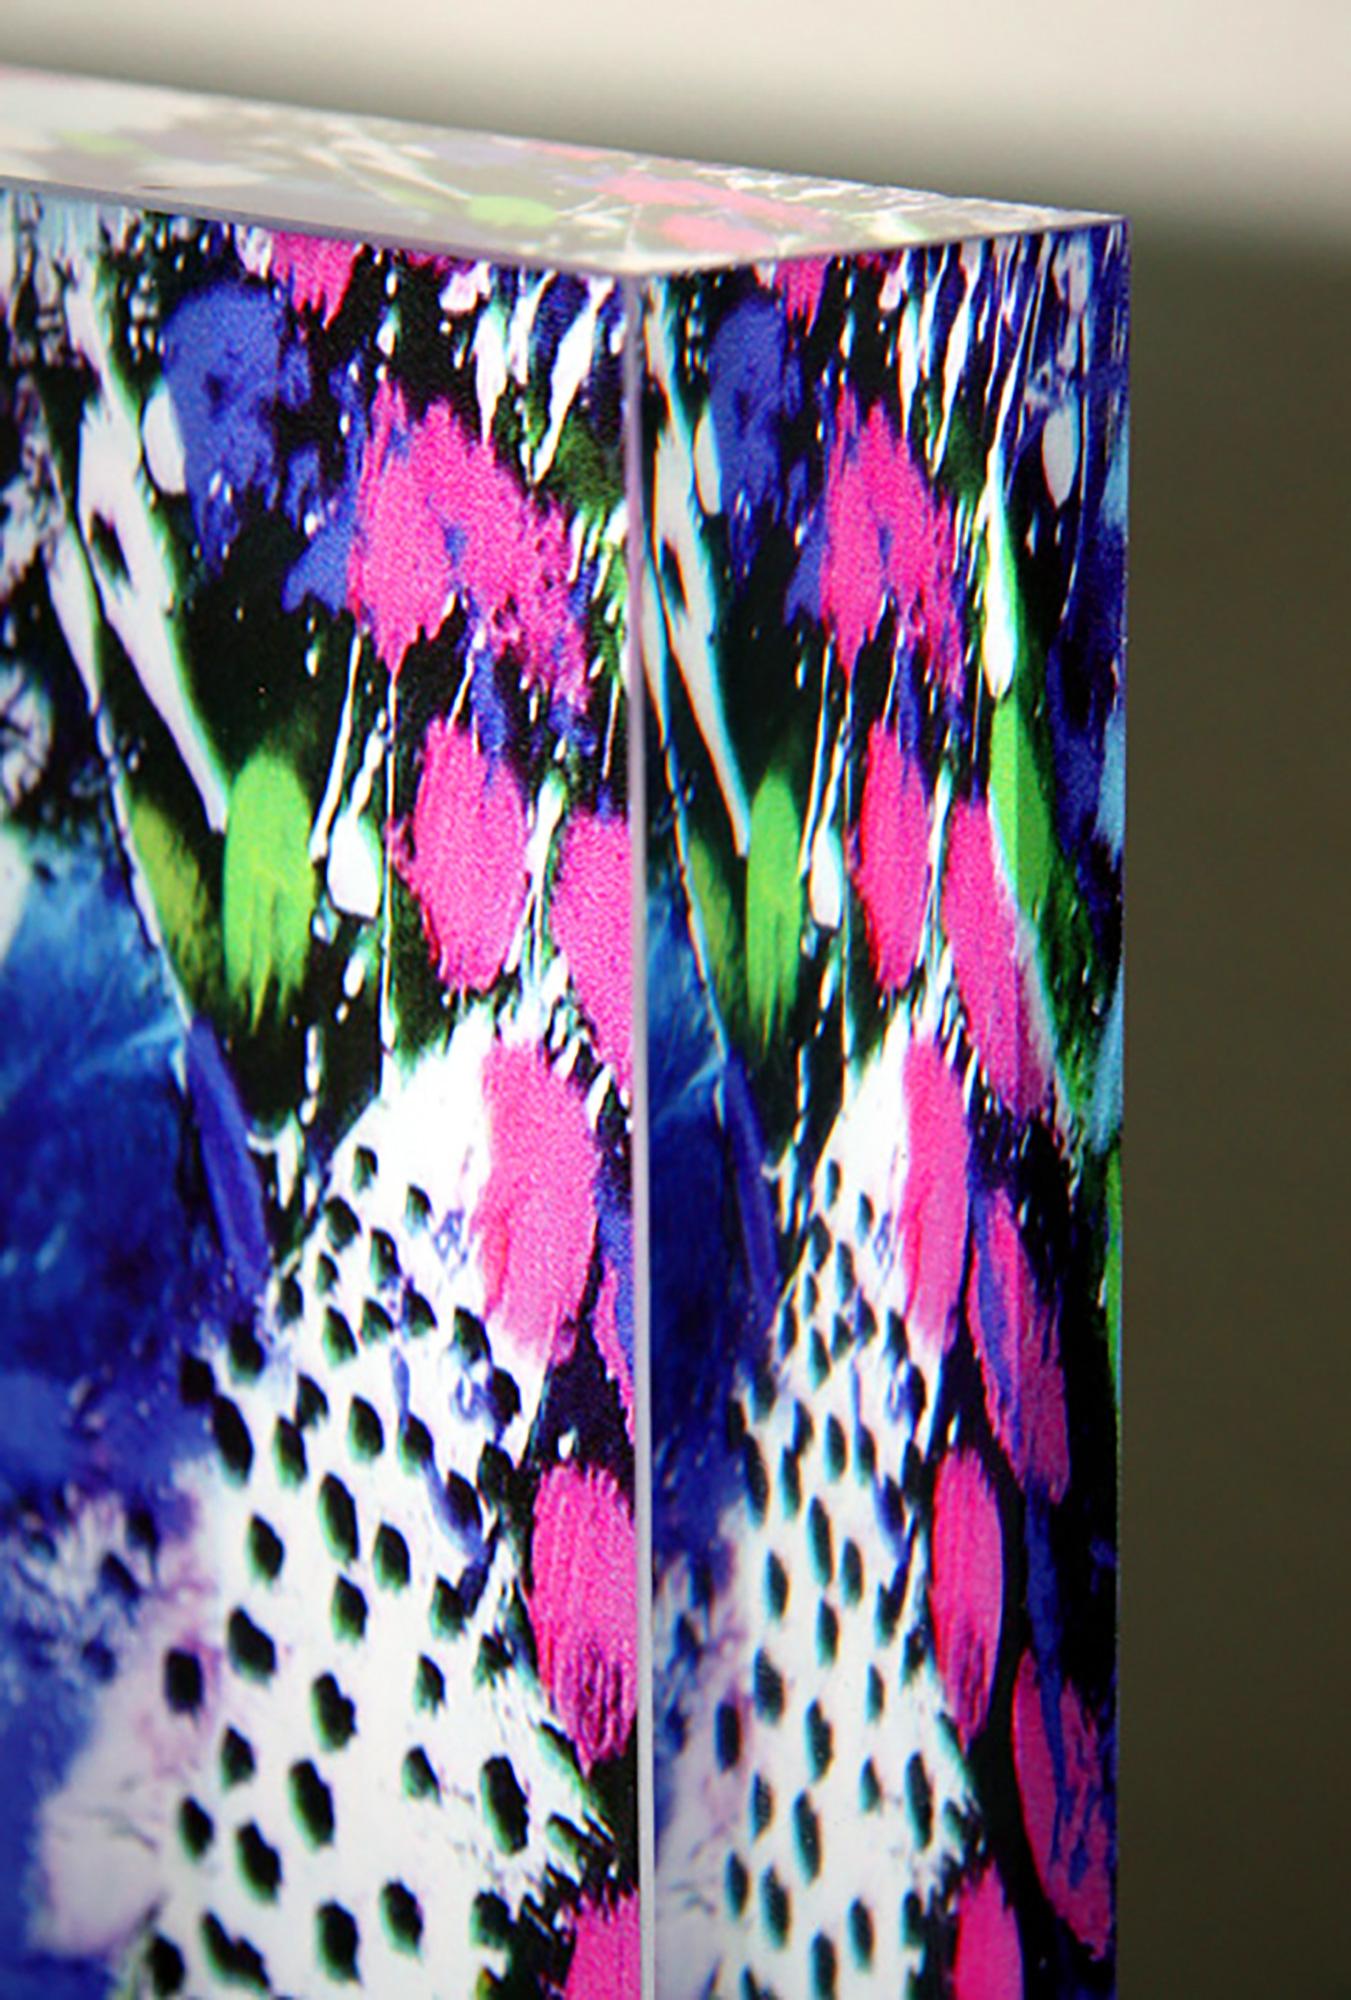 Objekt Transformation, Detail